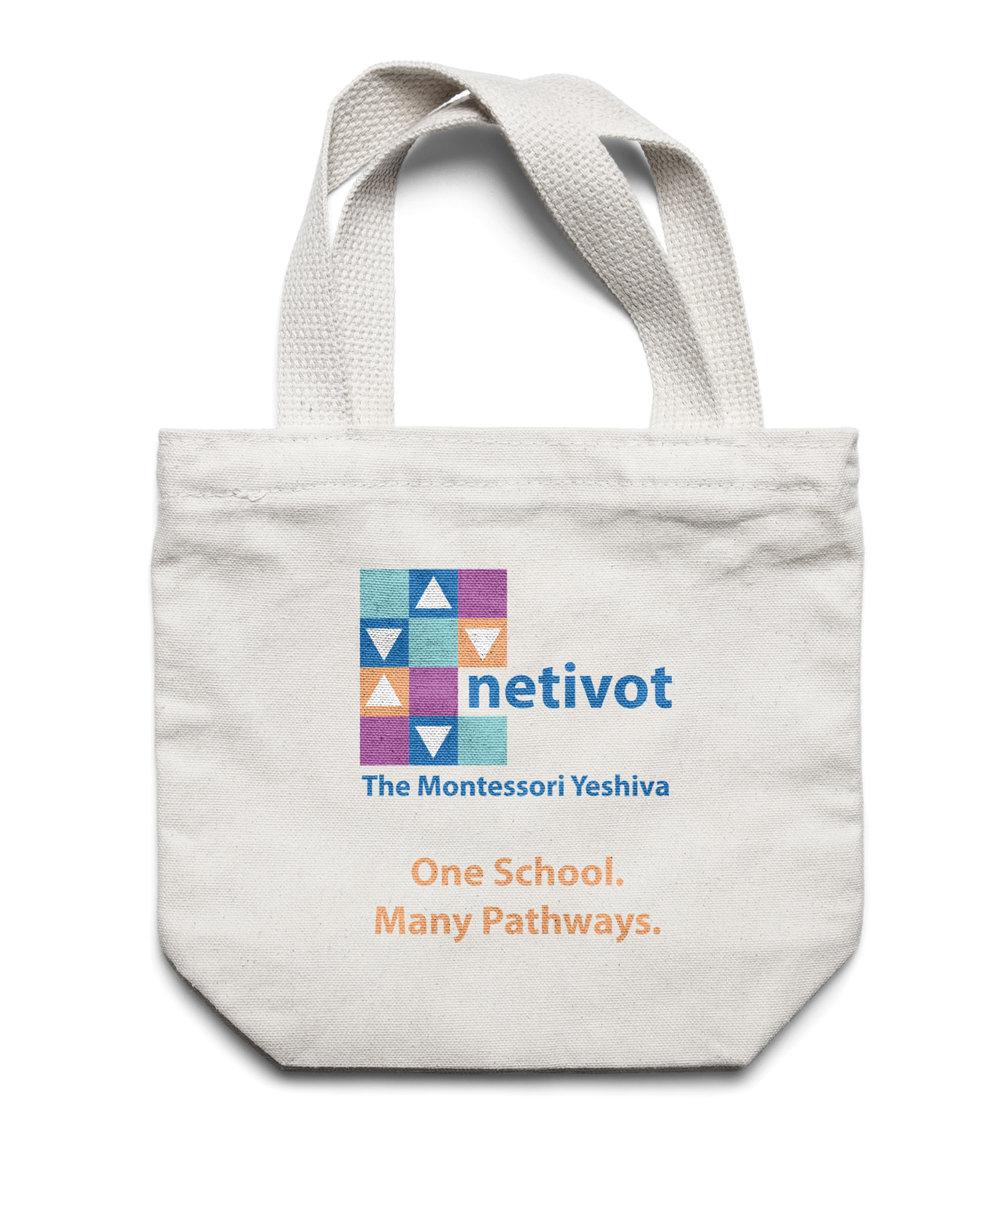 grass-creative-identity-montessori-school-NYC-NJ-netivot-school-merchandise.jpg